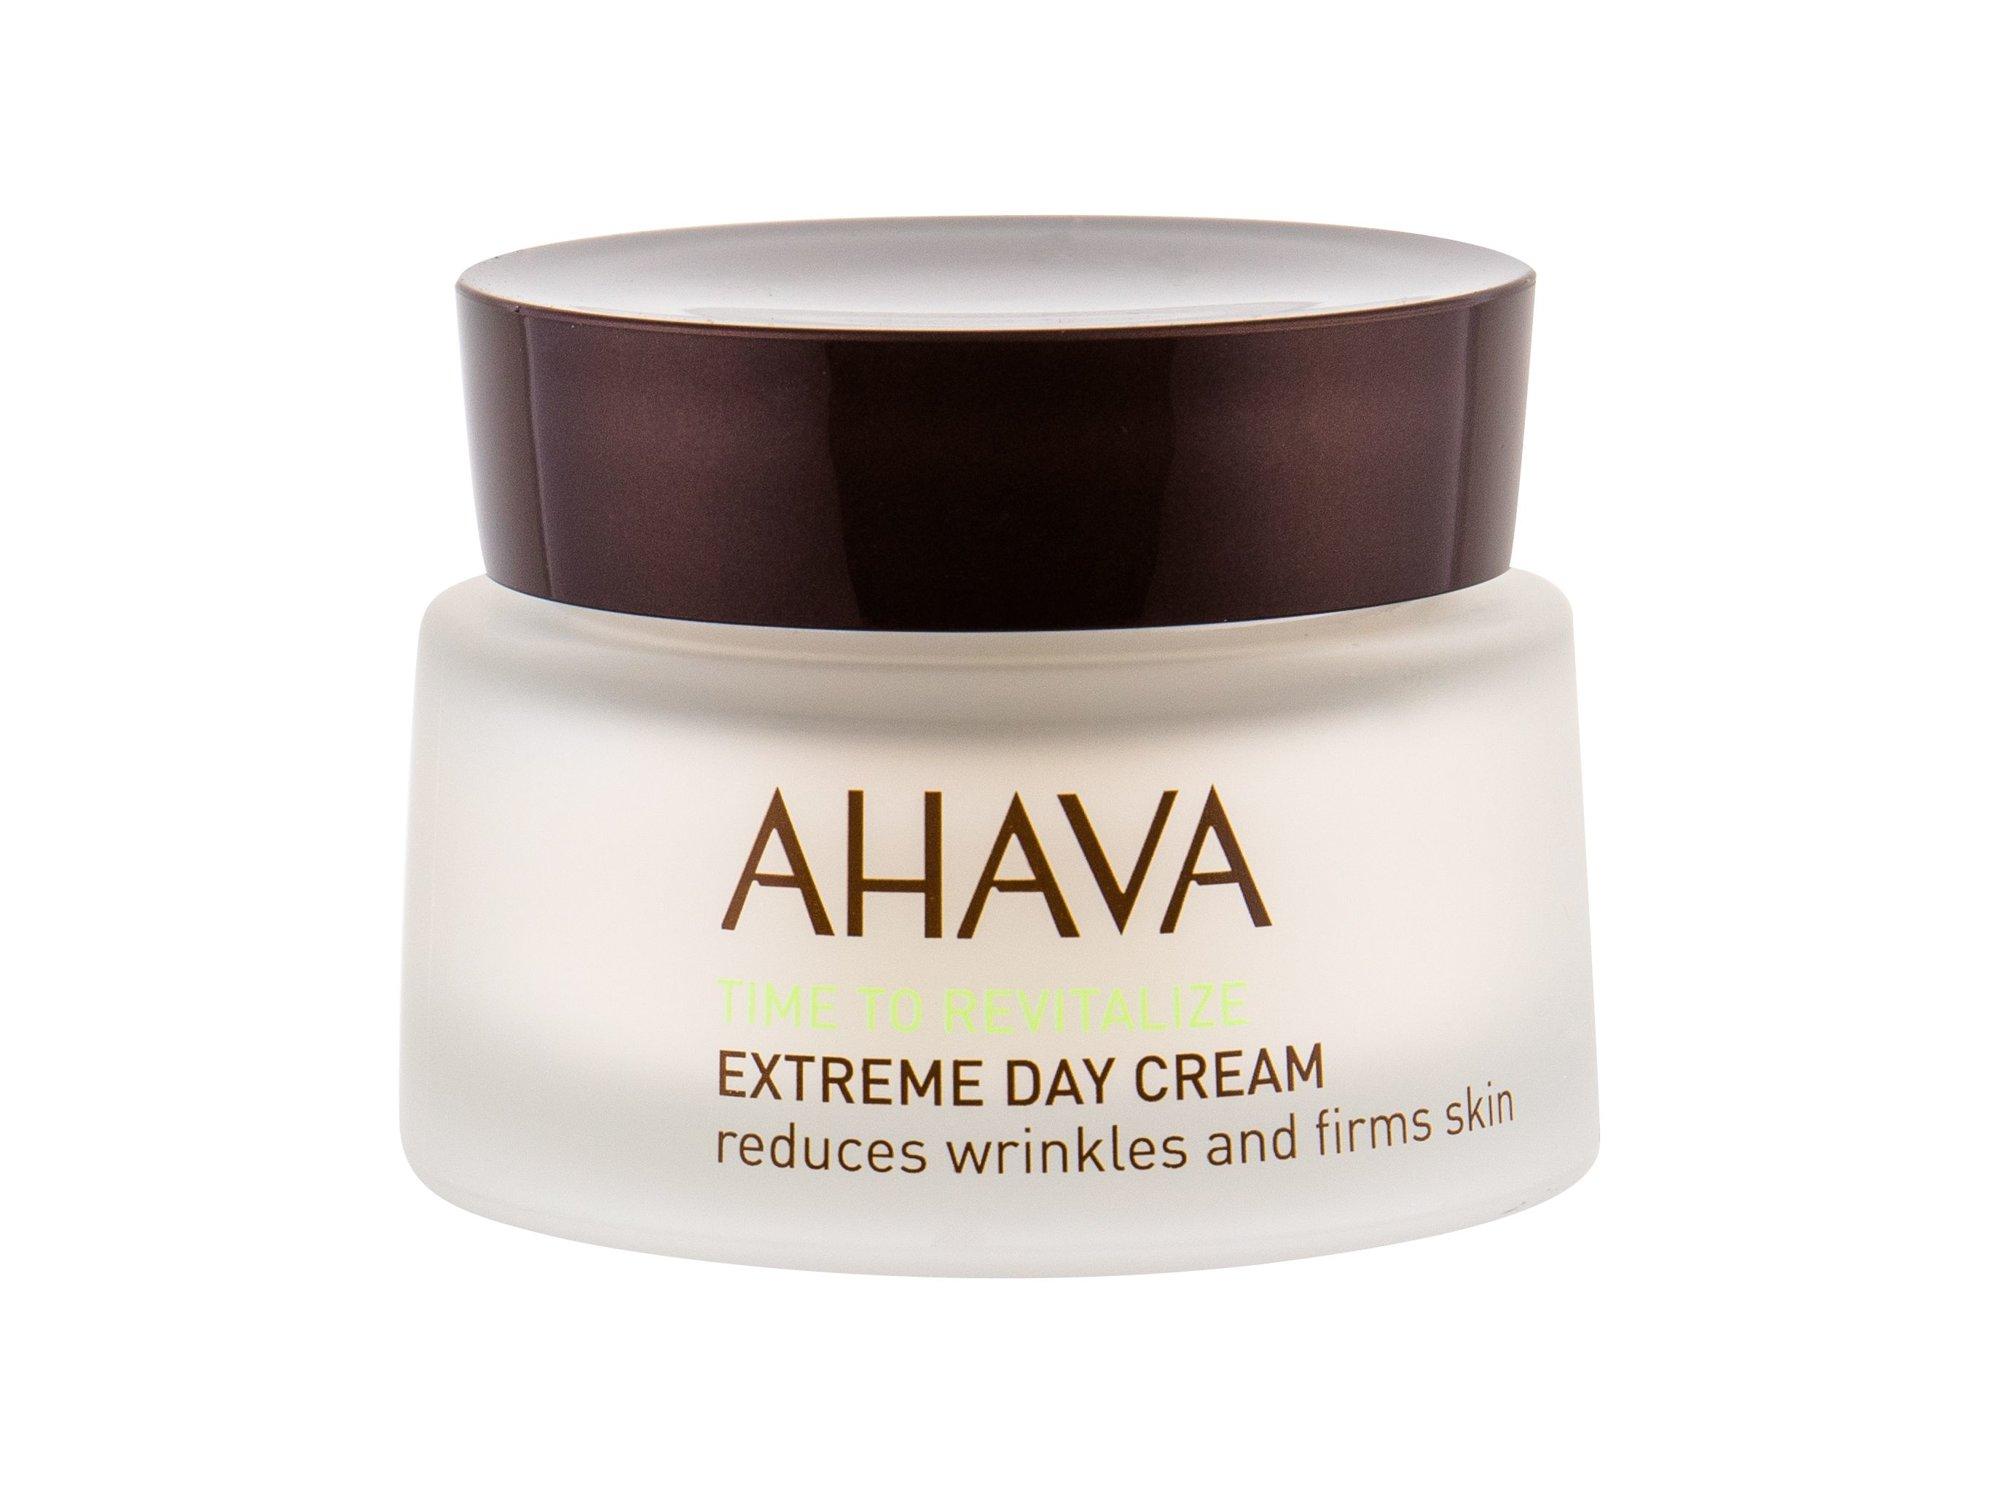 AHAVA Extreme Day Cream 50ml  Time To Revitalize